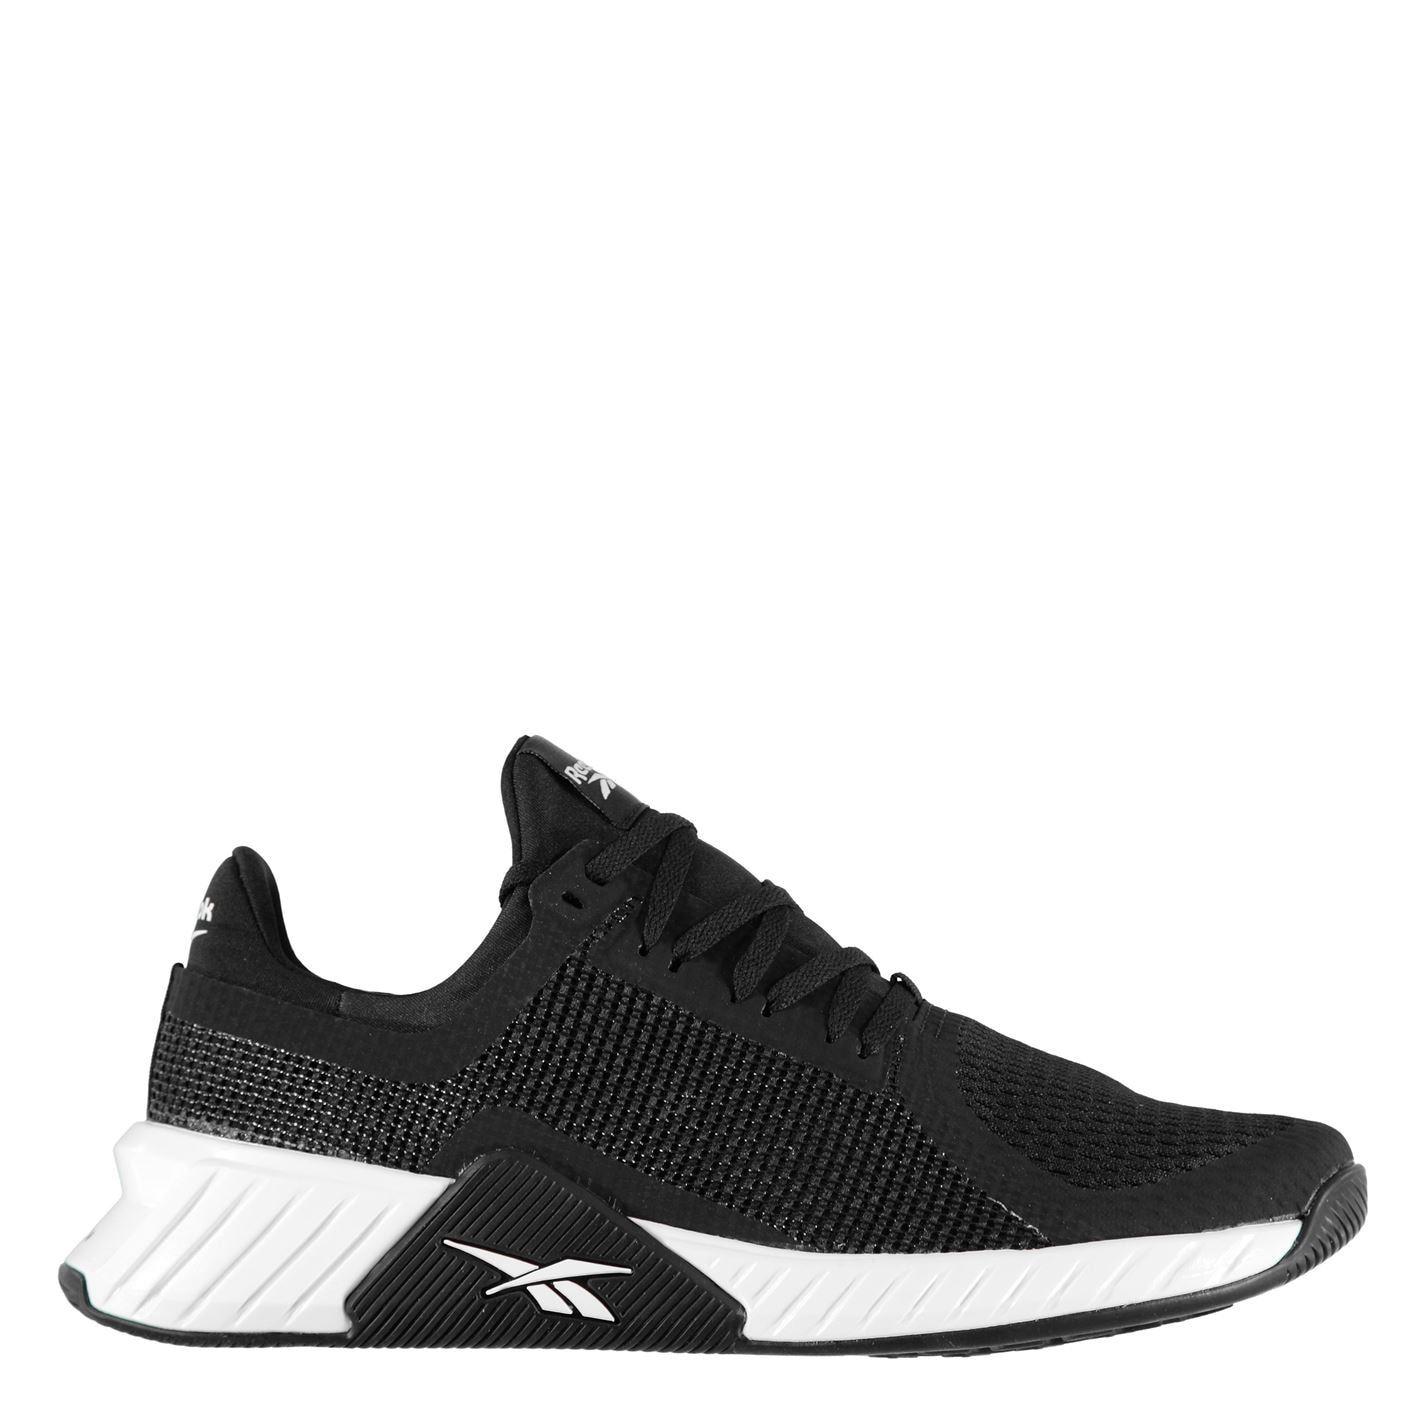 reebok men's flashfilm shoes